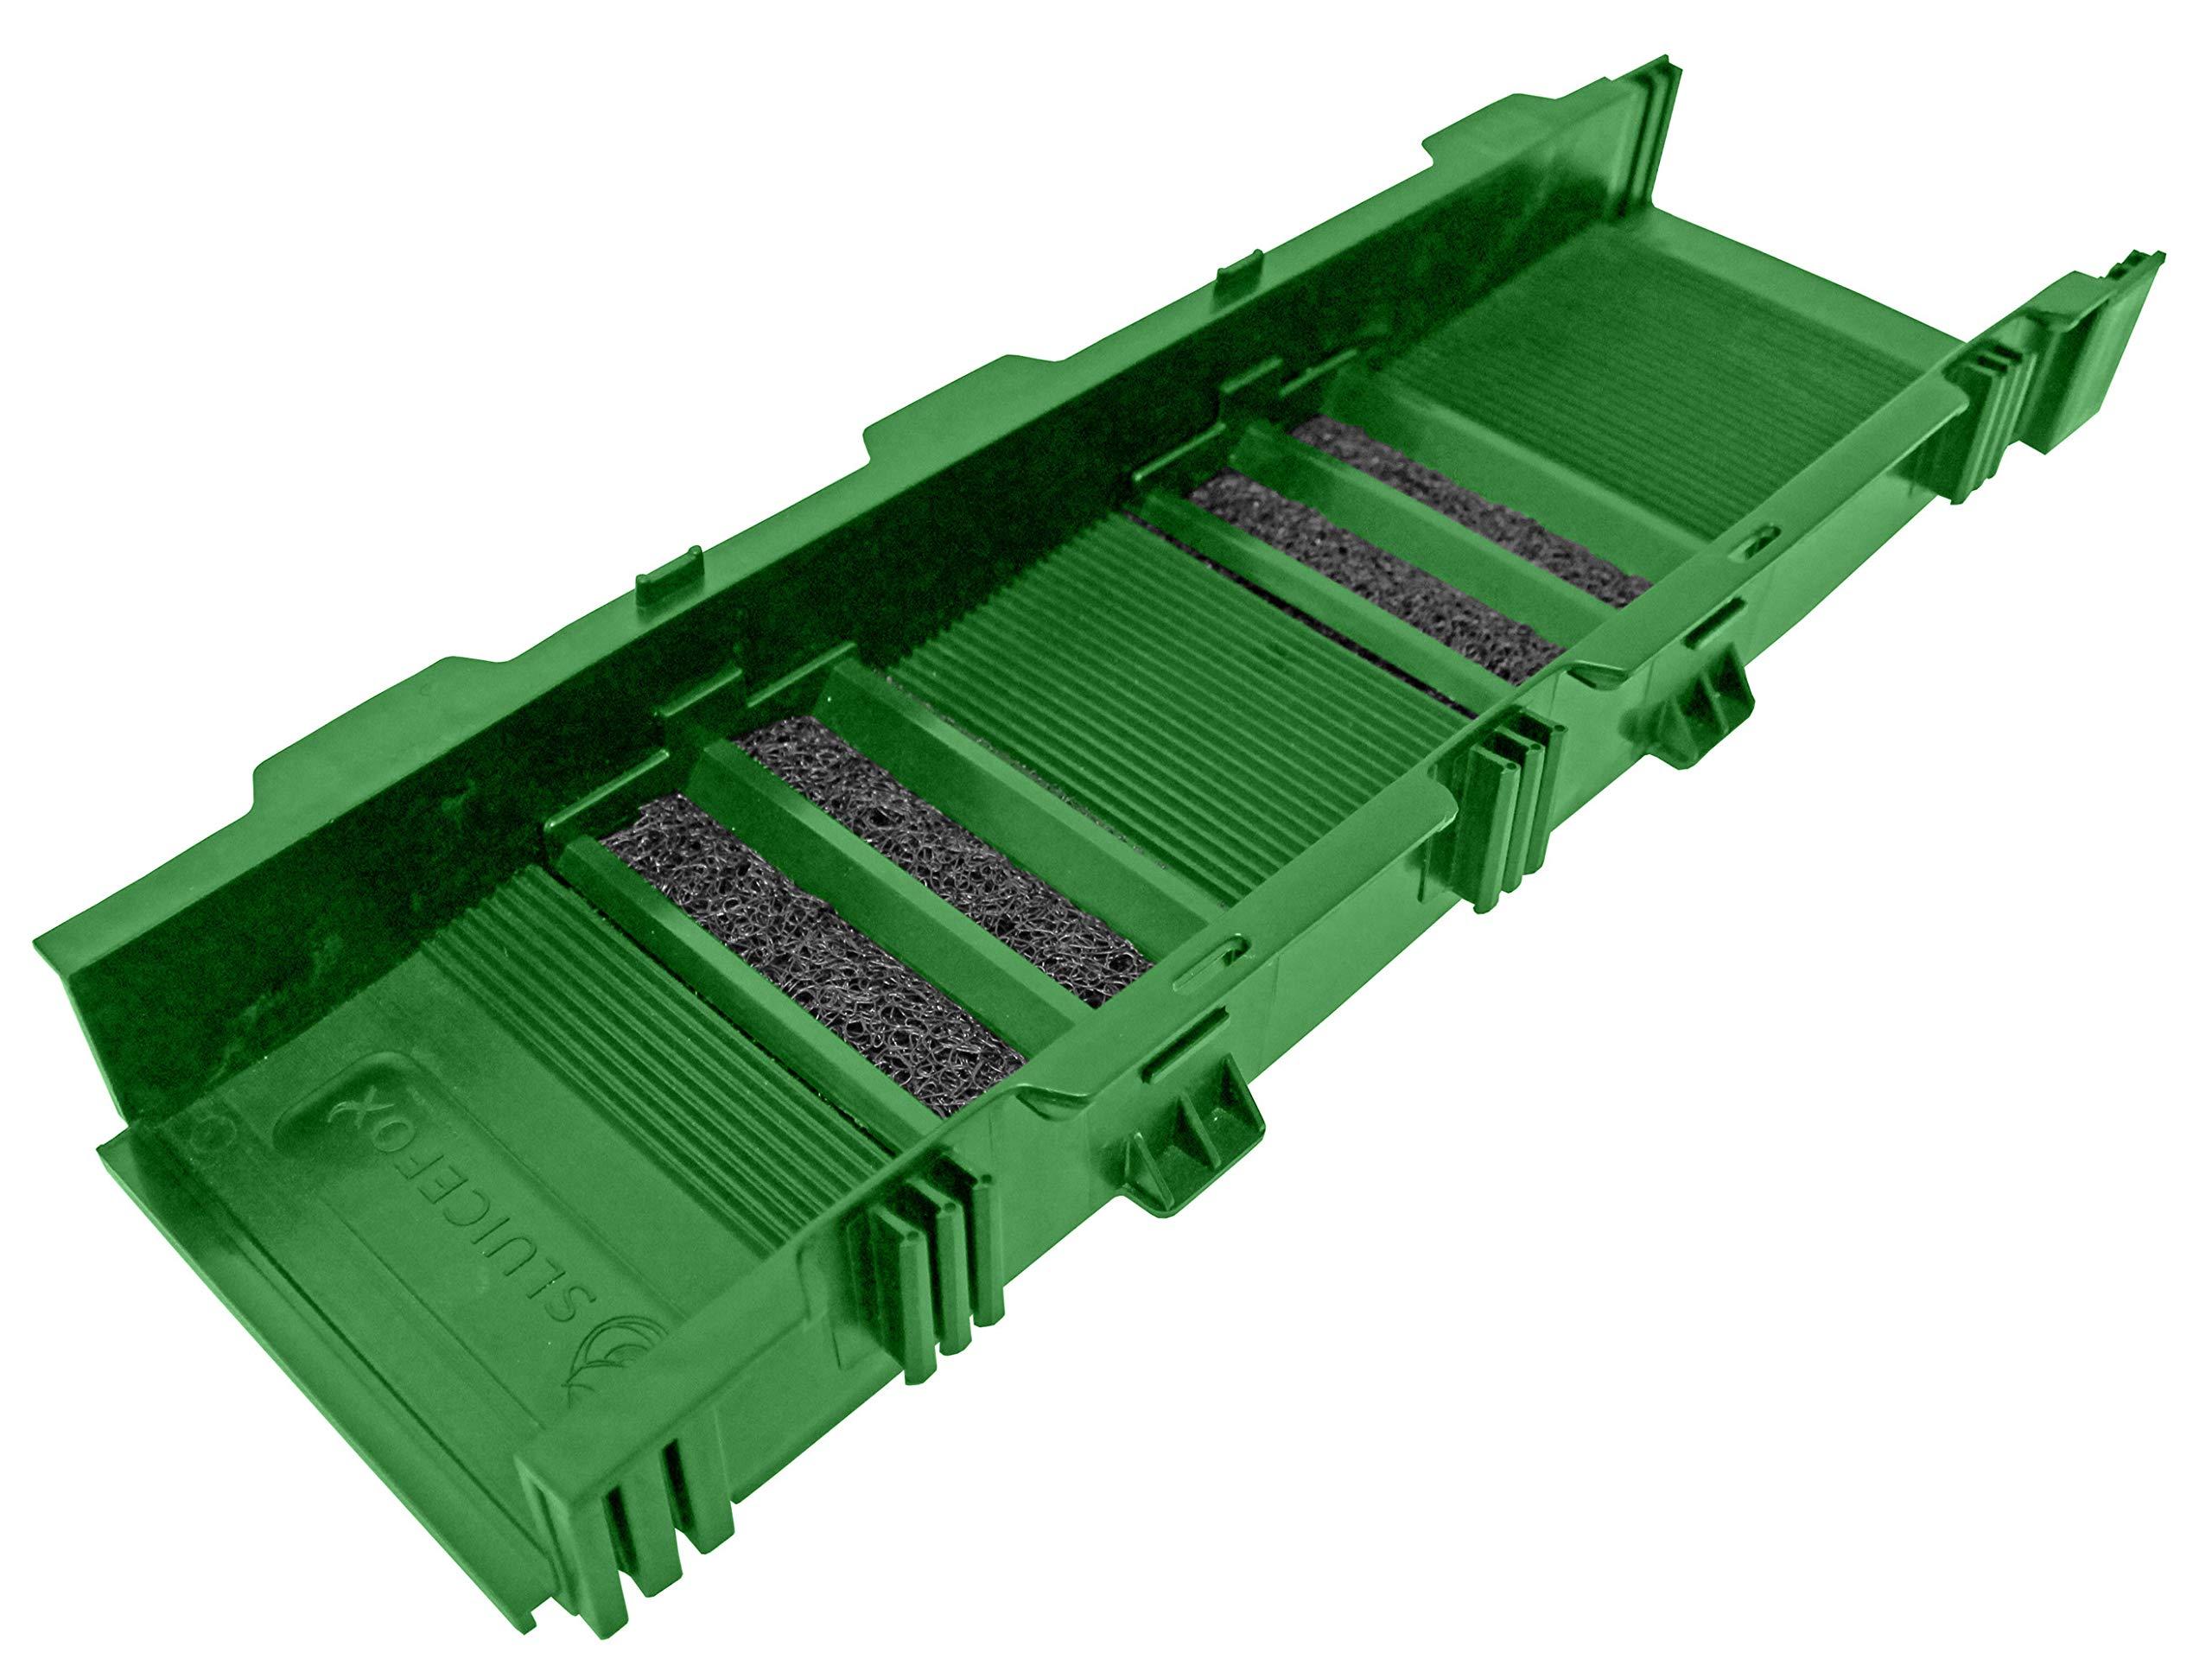 Sluice Fox 24'' Portable Modular Sluice Box (Green) Gold Panning Dredge Sluicing